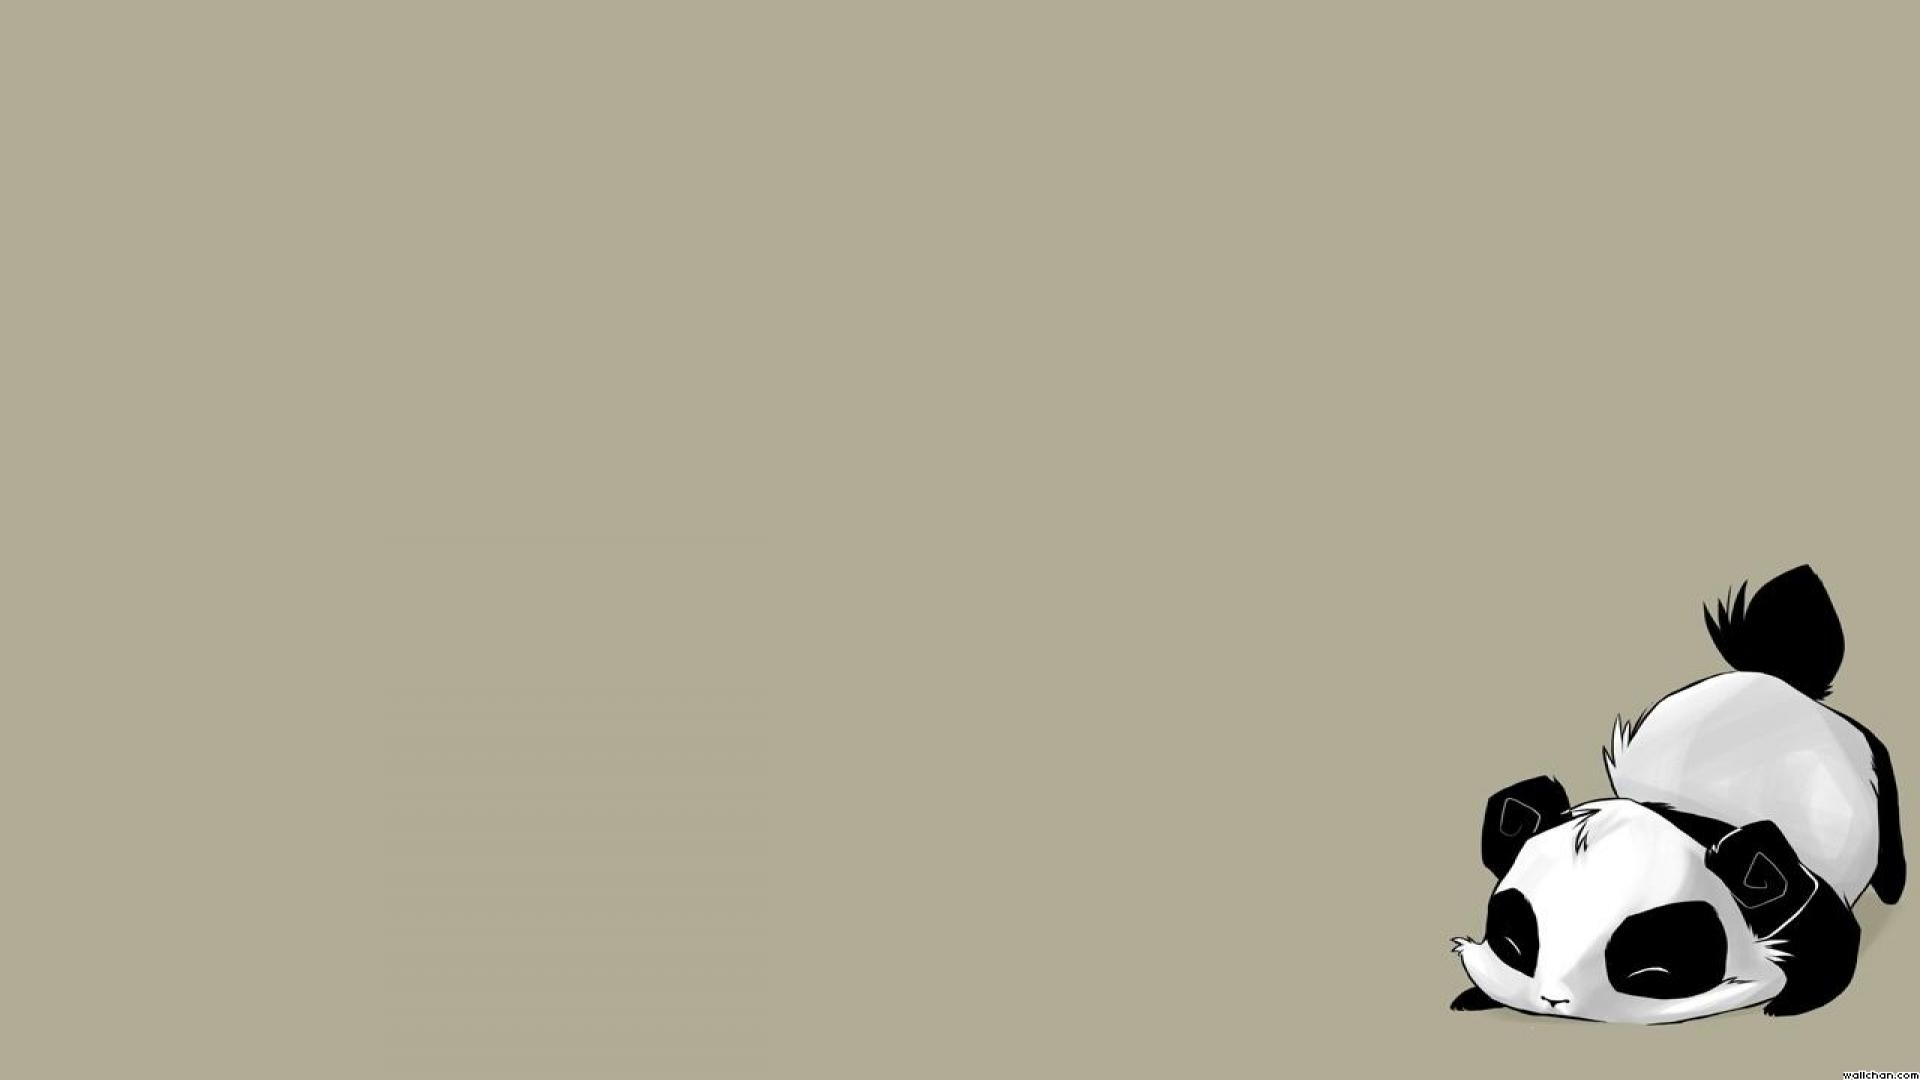 Free Download Cute Panda Wallpaper Hd For Desktop 1920x1080 1920x1080 For Your Desktop Mobile Tablet Explore 43 Hd Wallpapers Of Cute Things Free Wallpaper For Laptop Screen Wallpapers That